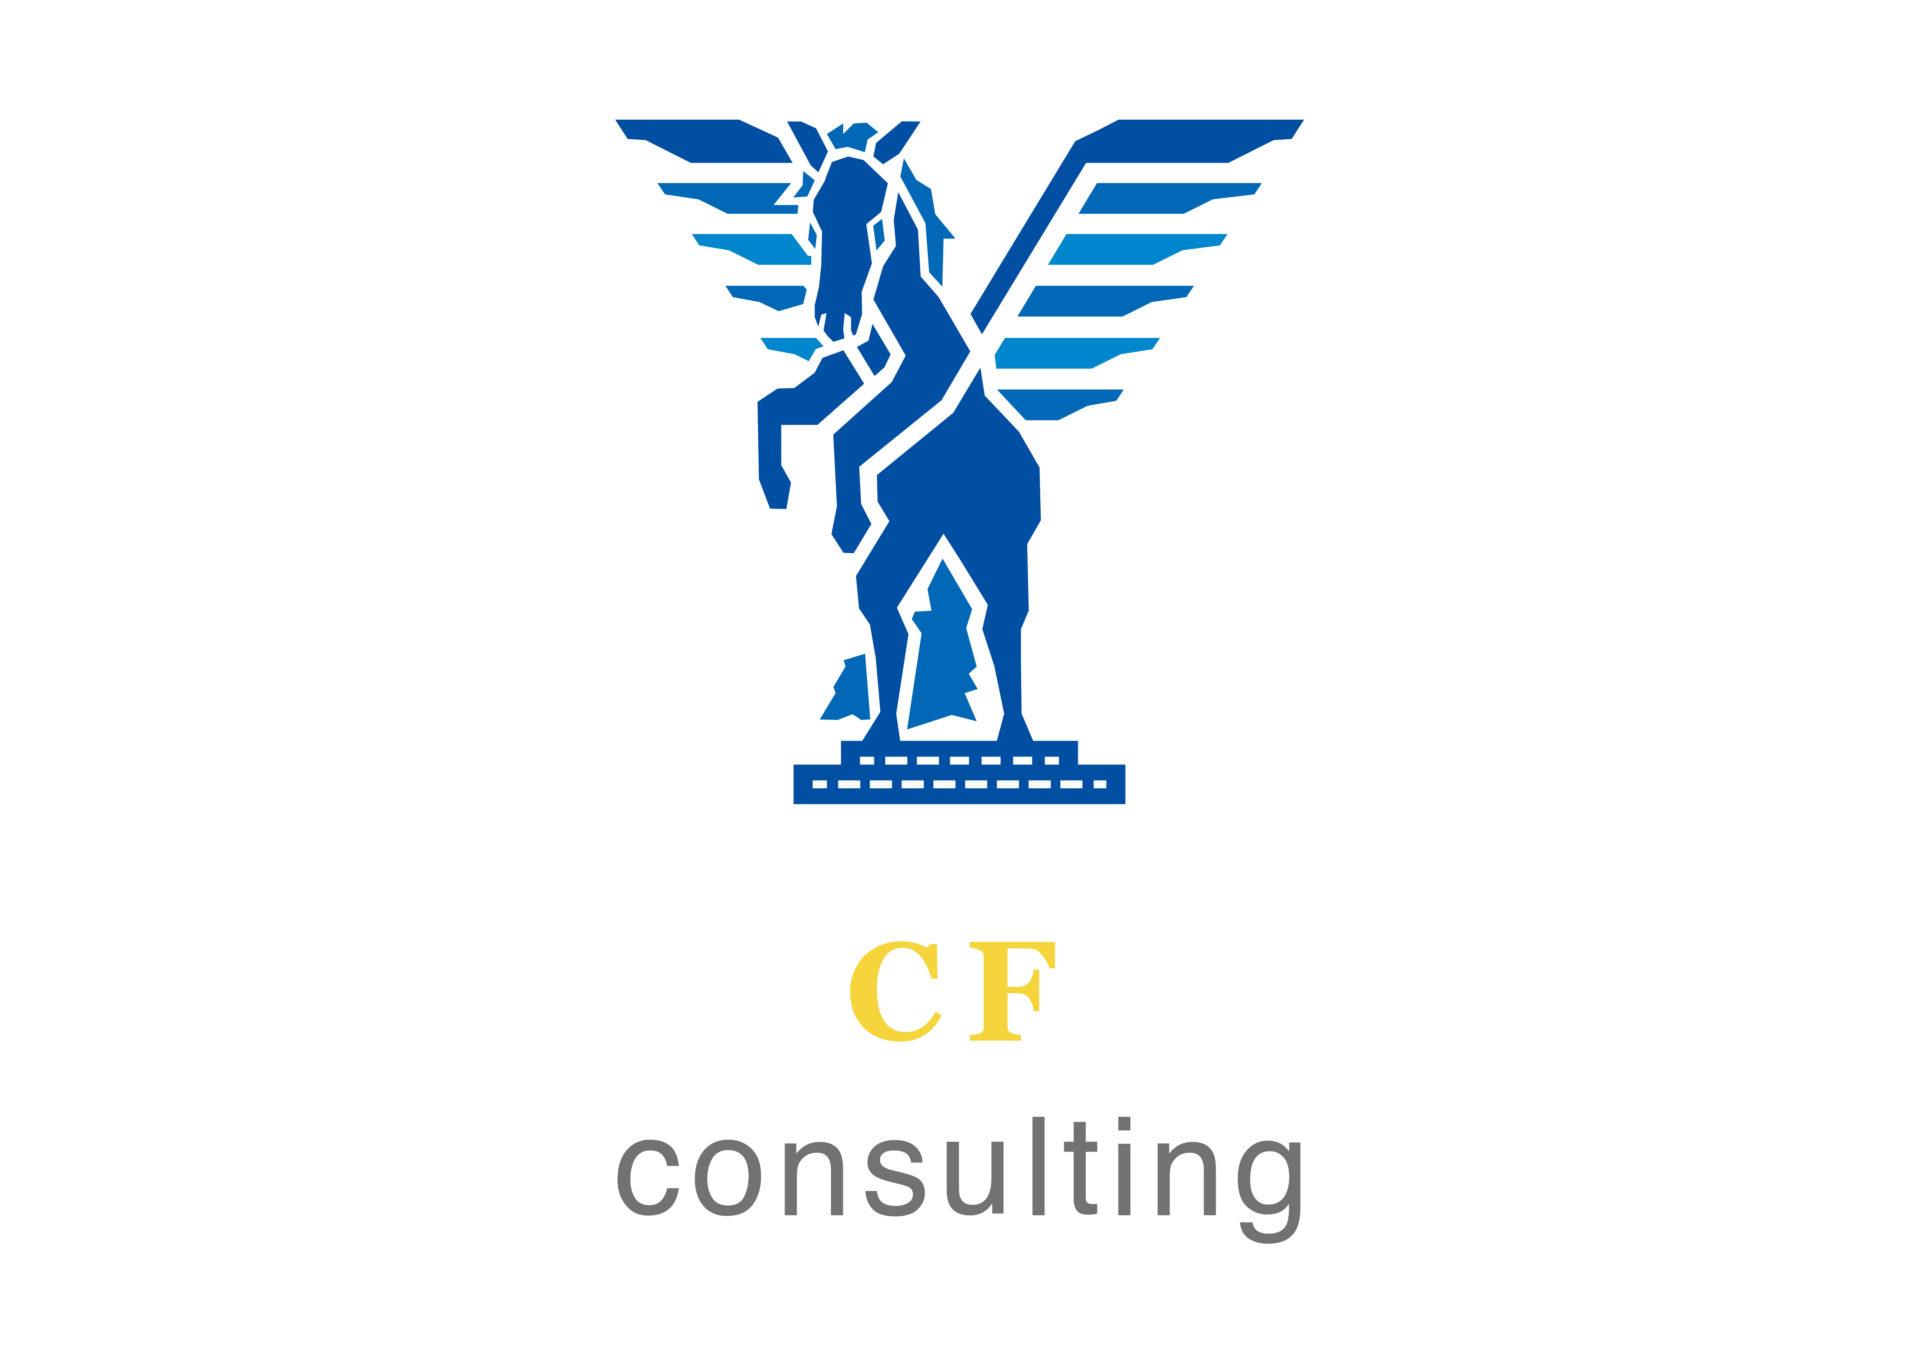 CF コンサルティング ロゴ